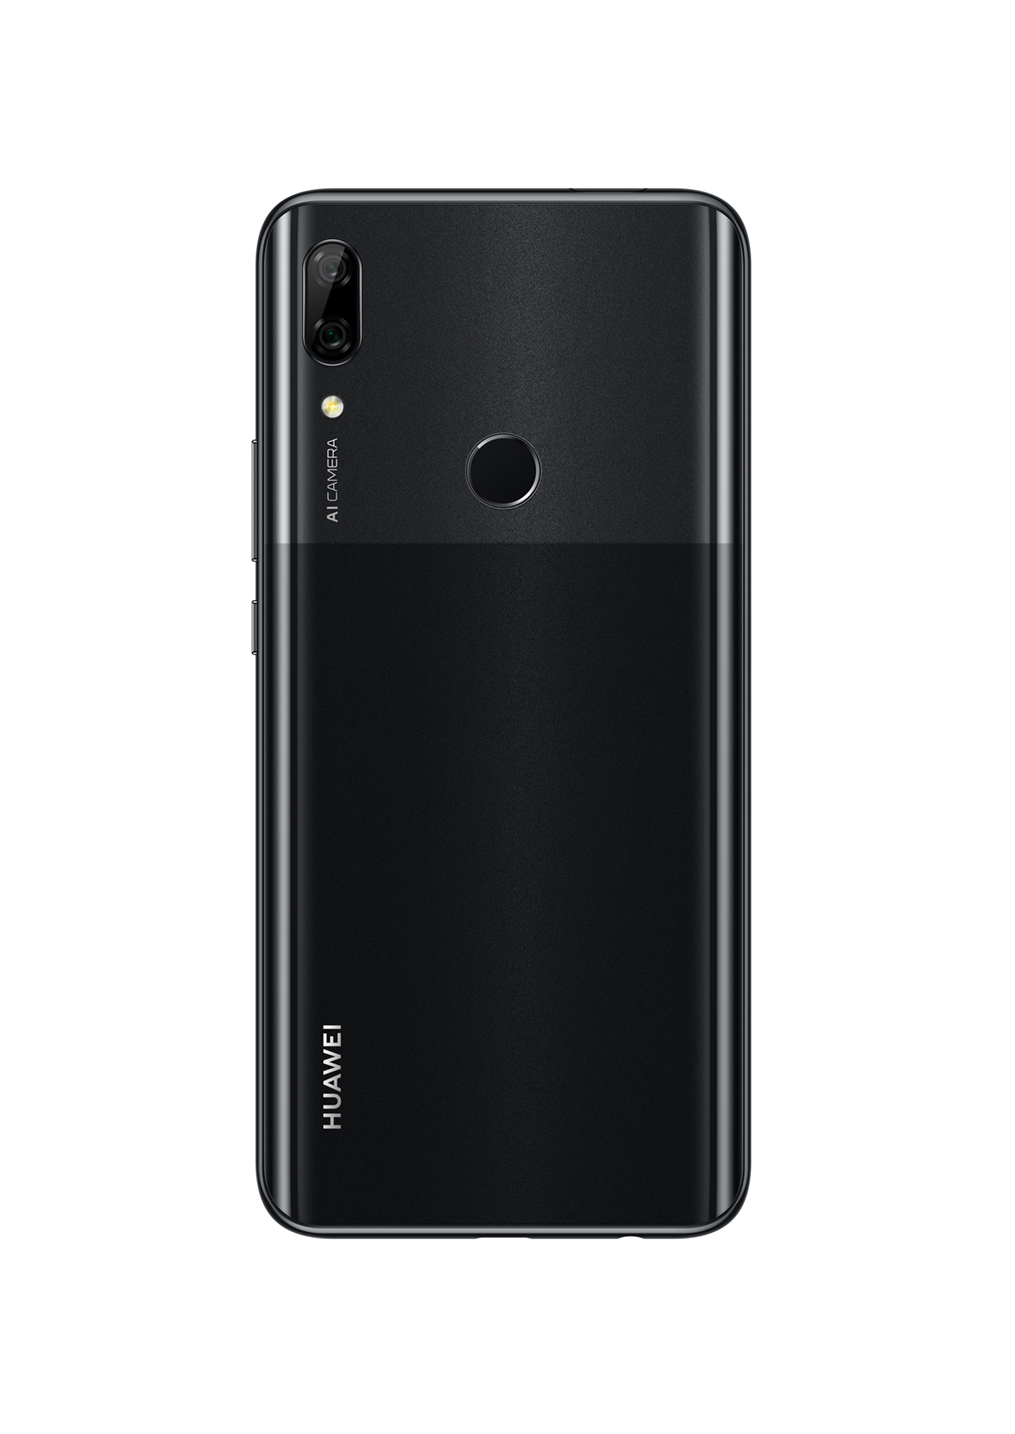 Huawei PSmart Zидёт впродажу вРоссии